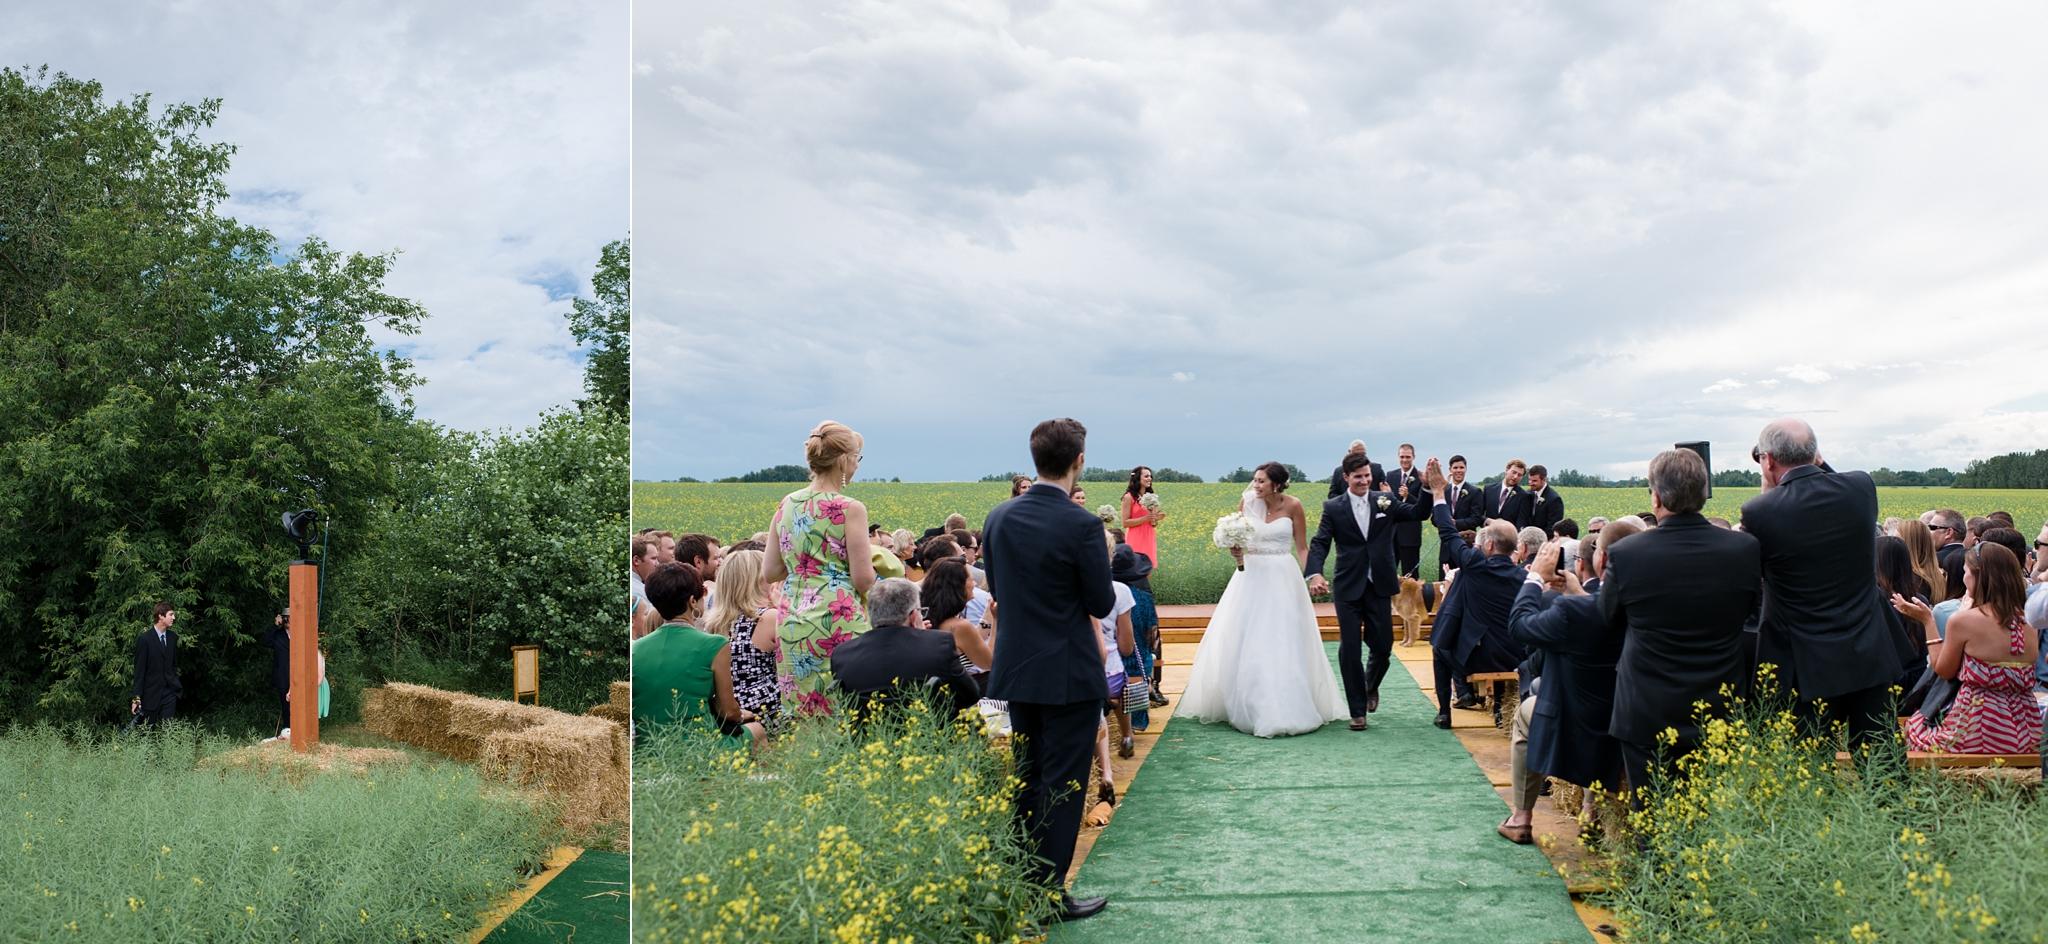 kaihla_tonai_intimate_wedding_elopement_photographer_0061